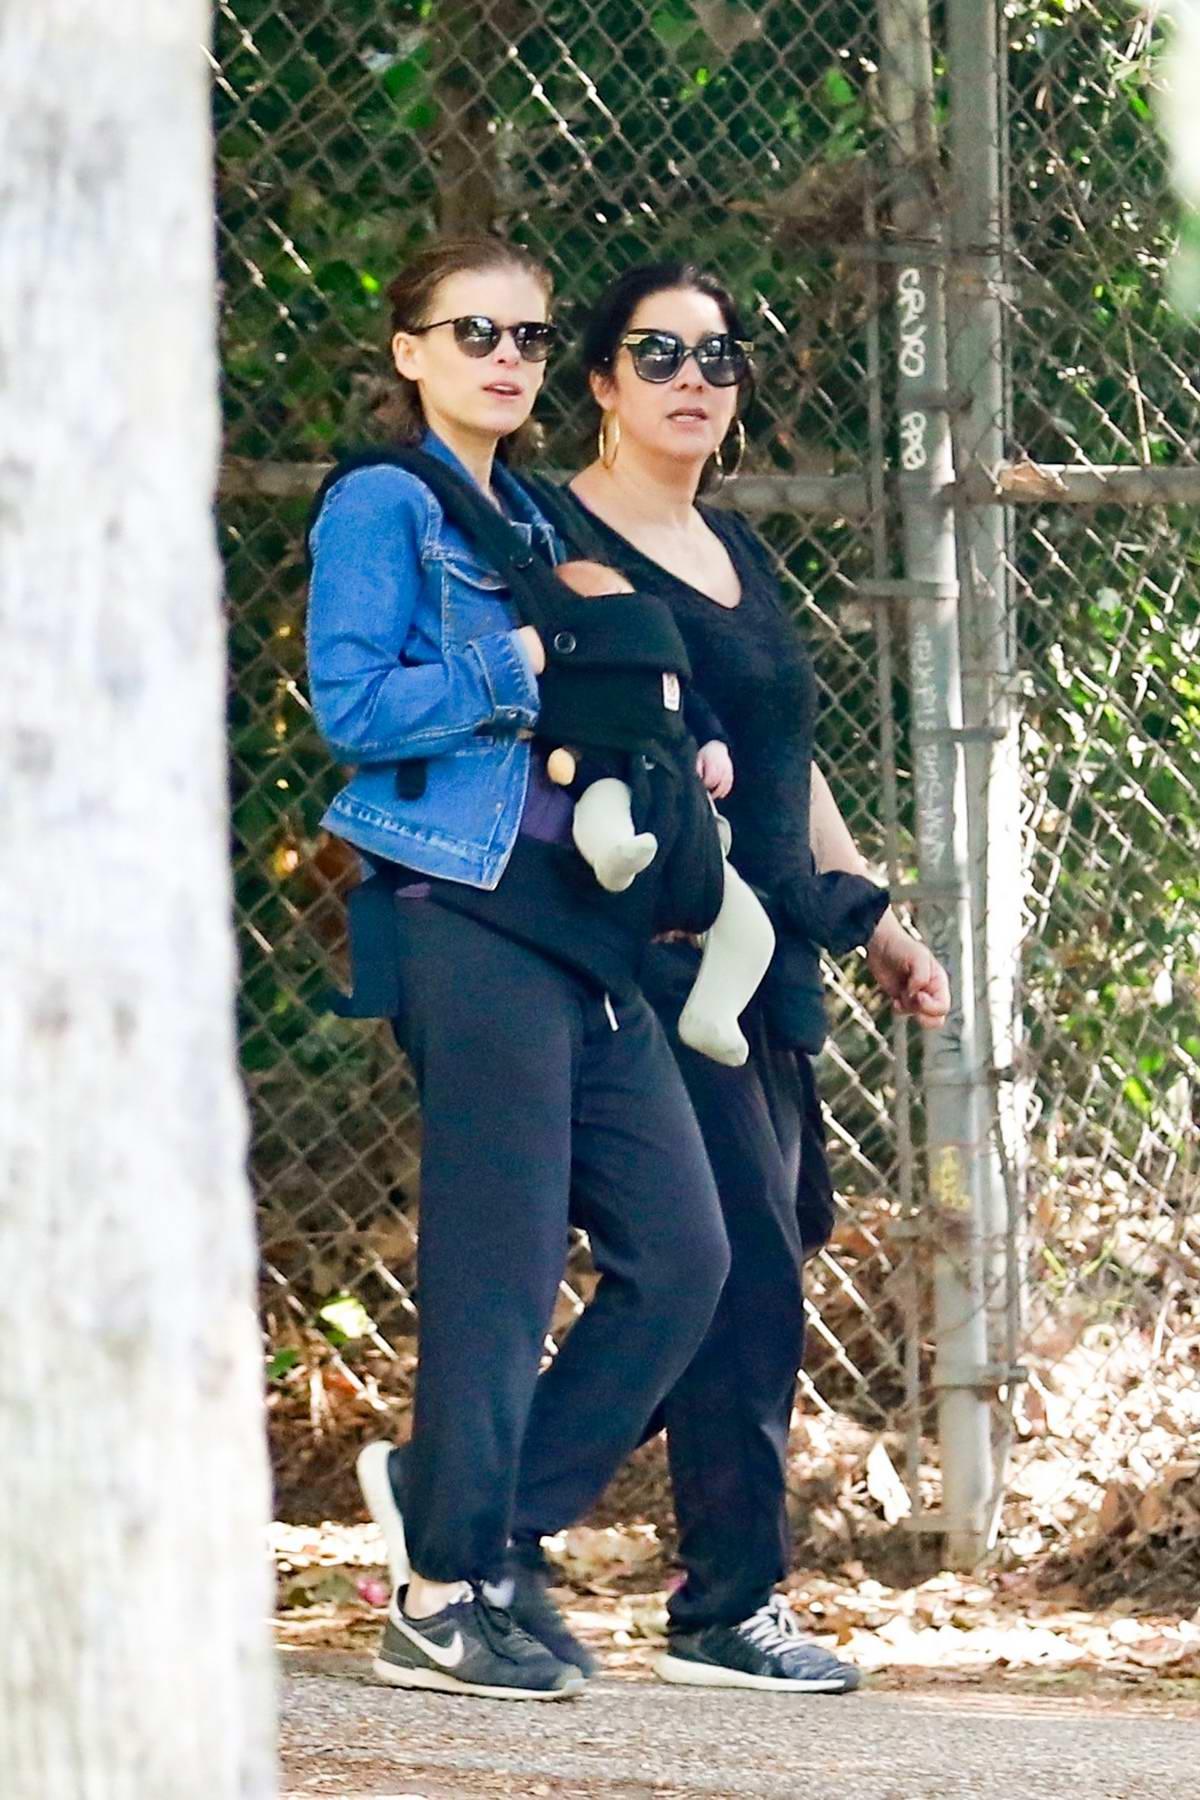 Kate Mara brings her adorable baby girl on hike through Griffith Park in Los Feliz, California